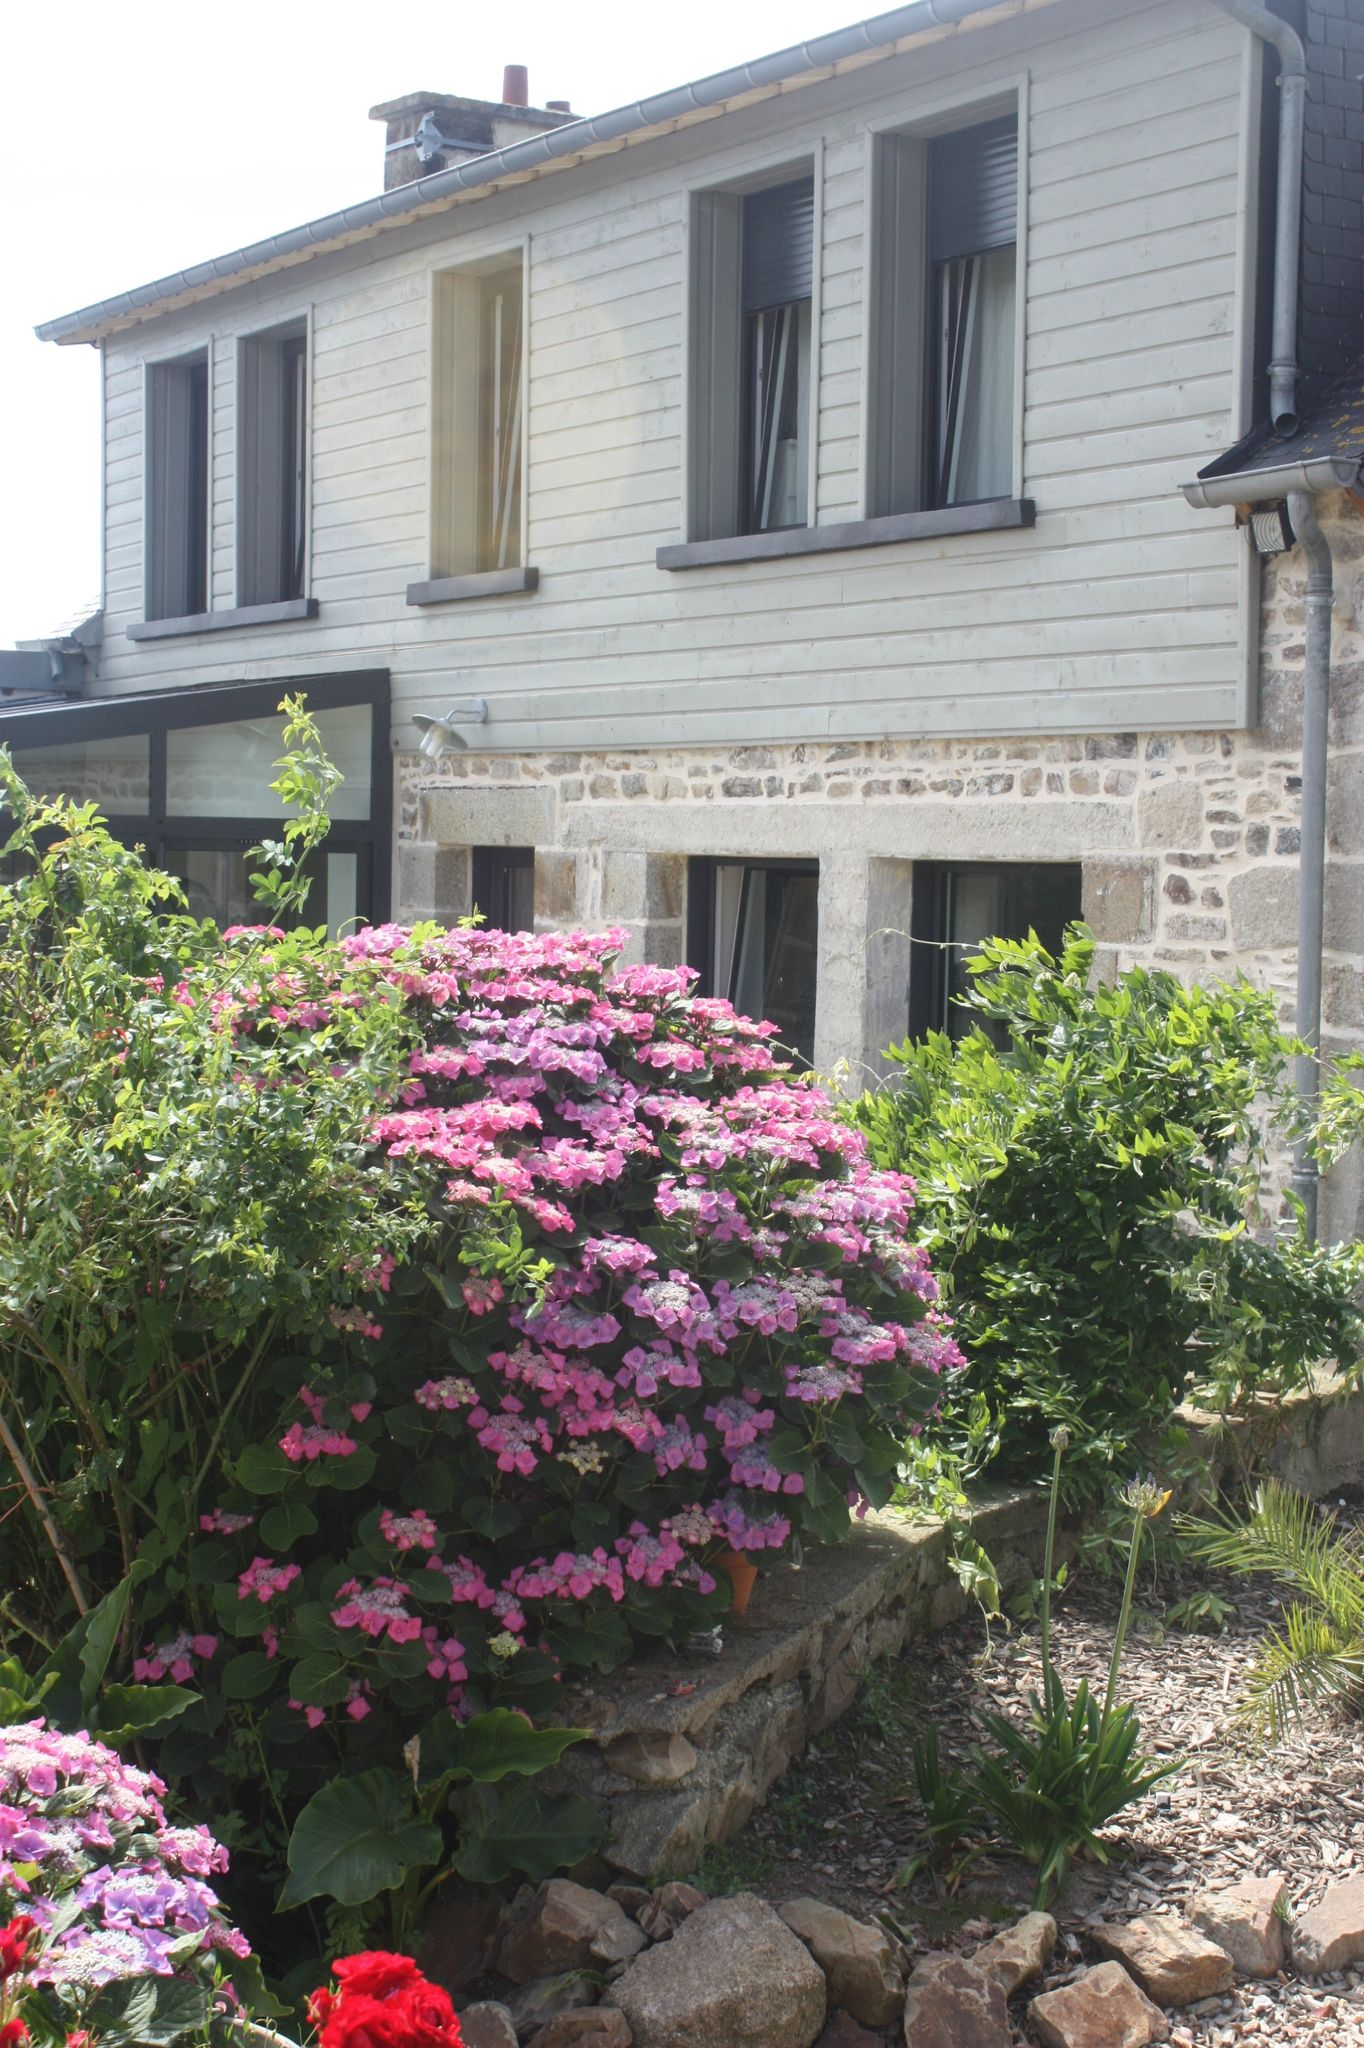 Img 9531 maison d 39 h tes locations vacances bretagne - Chambre d hote st malo bord de mer ...